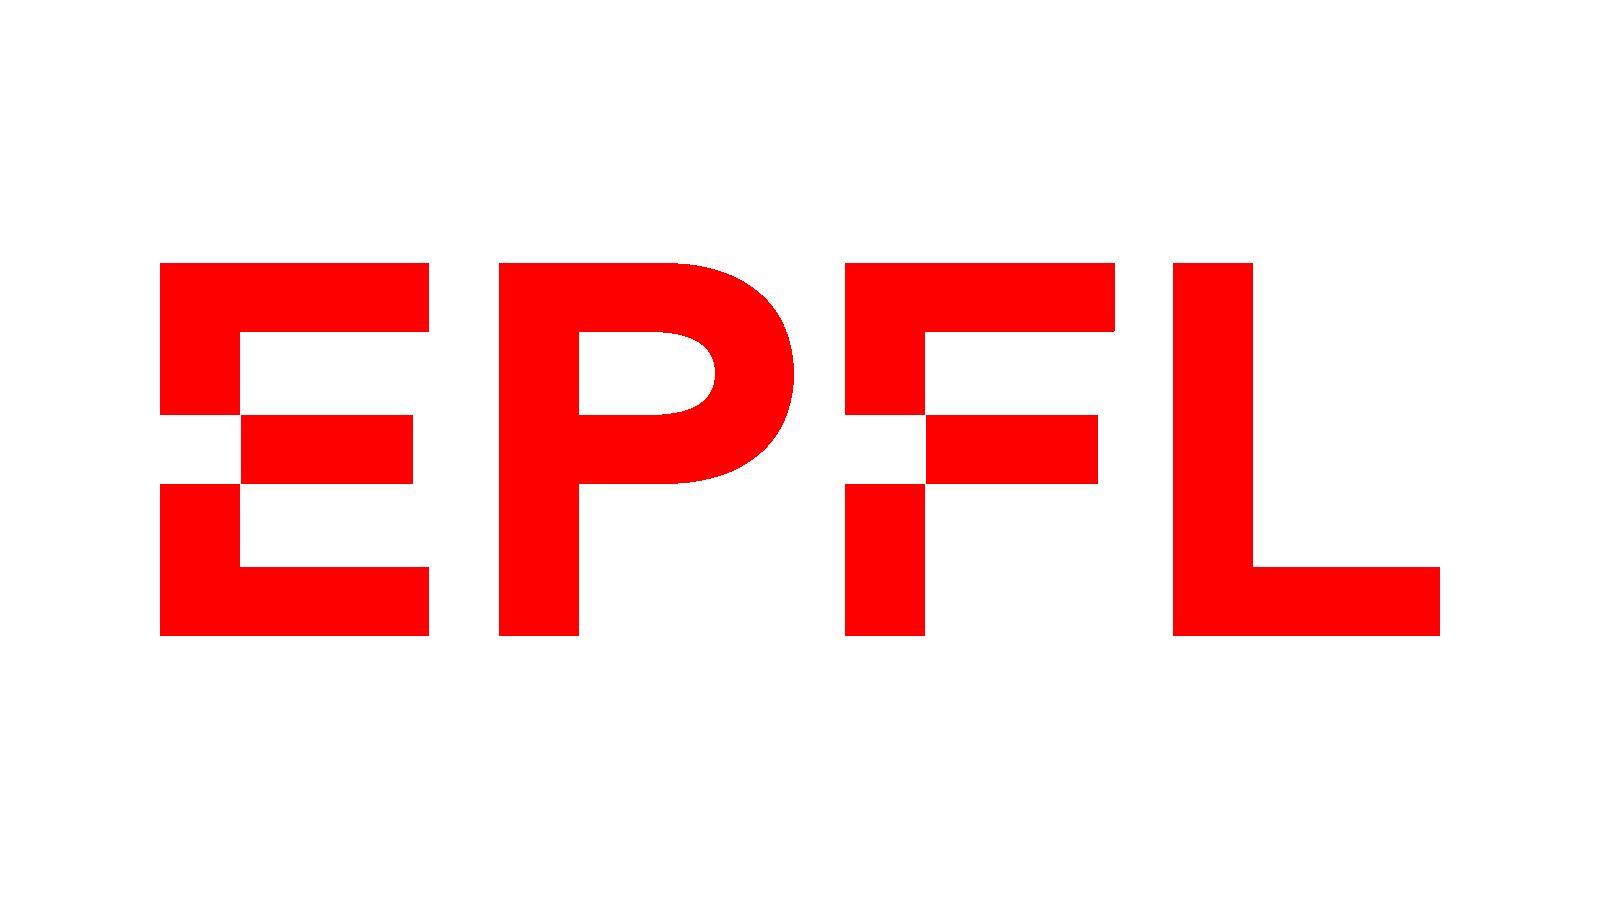 Escuela Politécnica Federal de Lausana